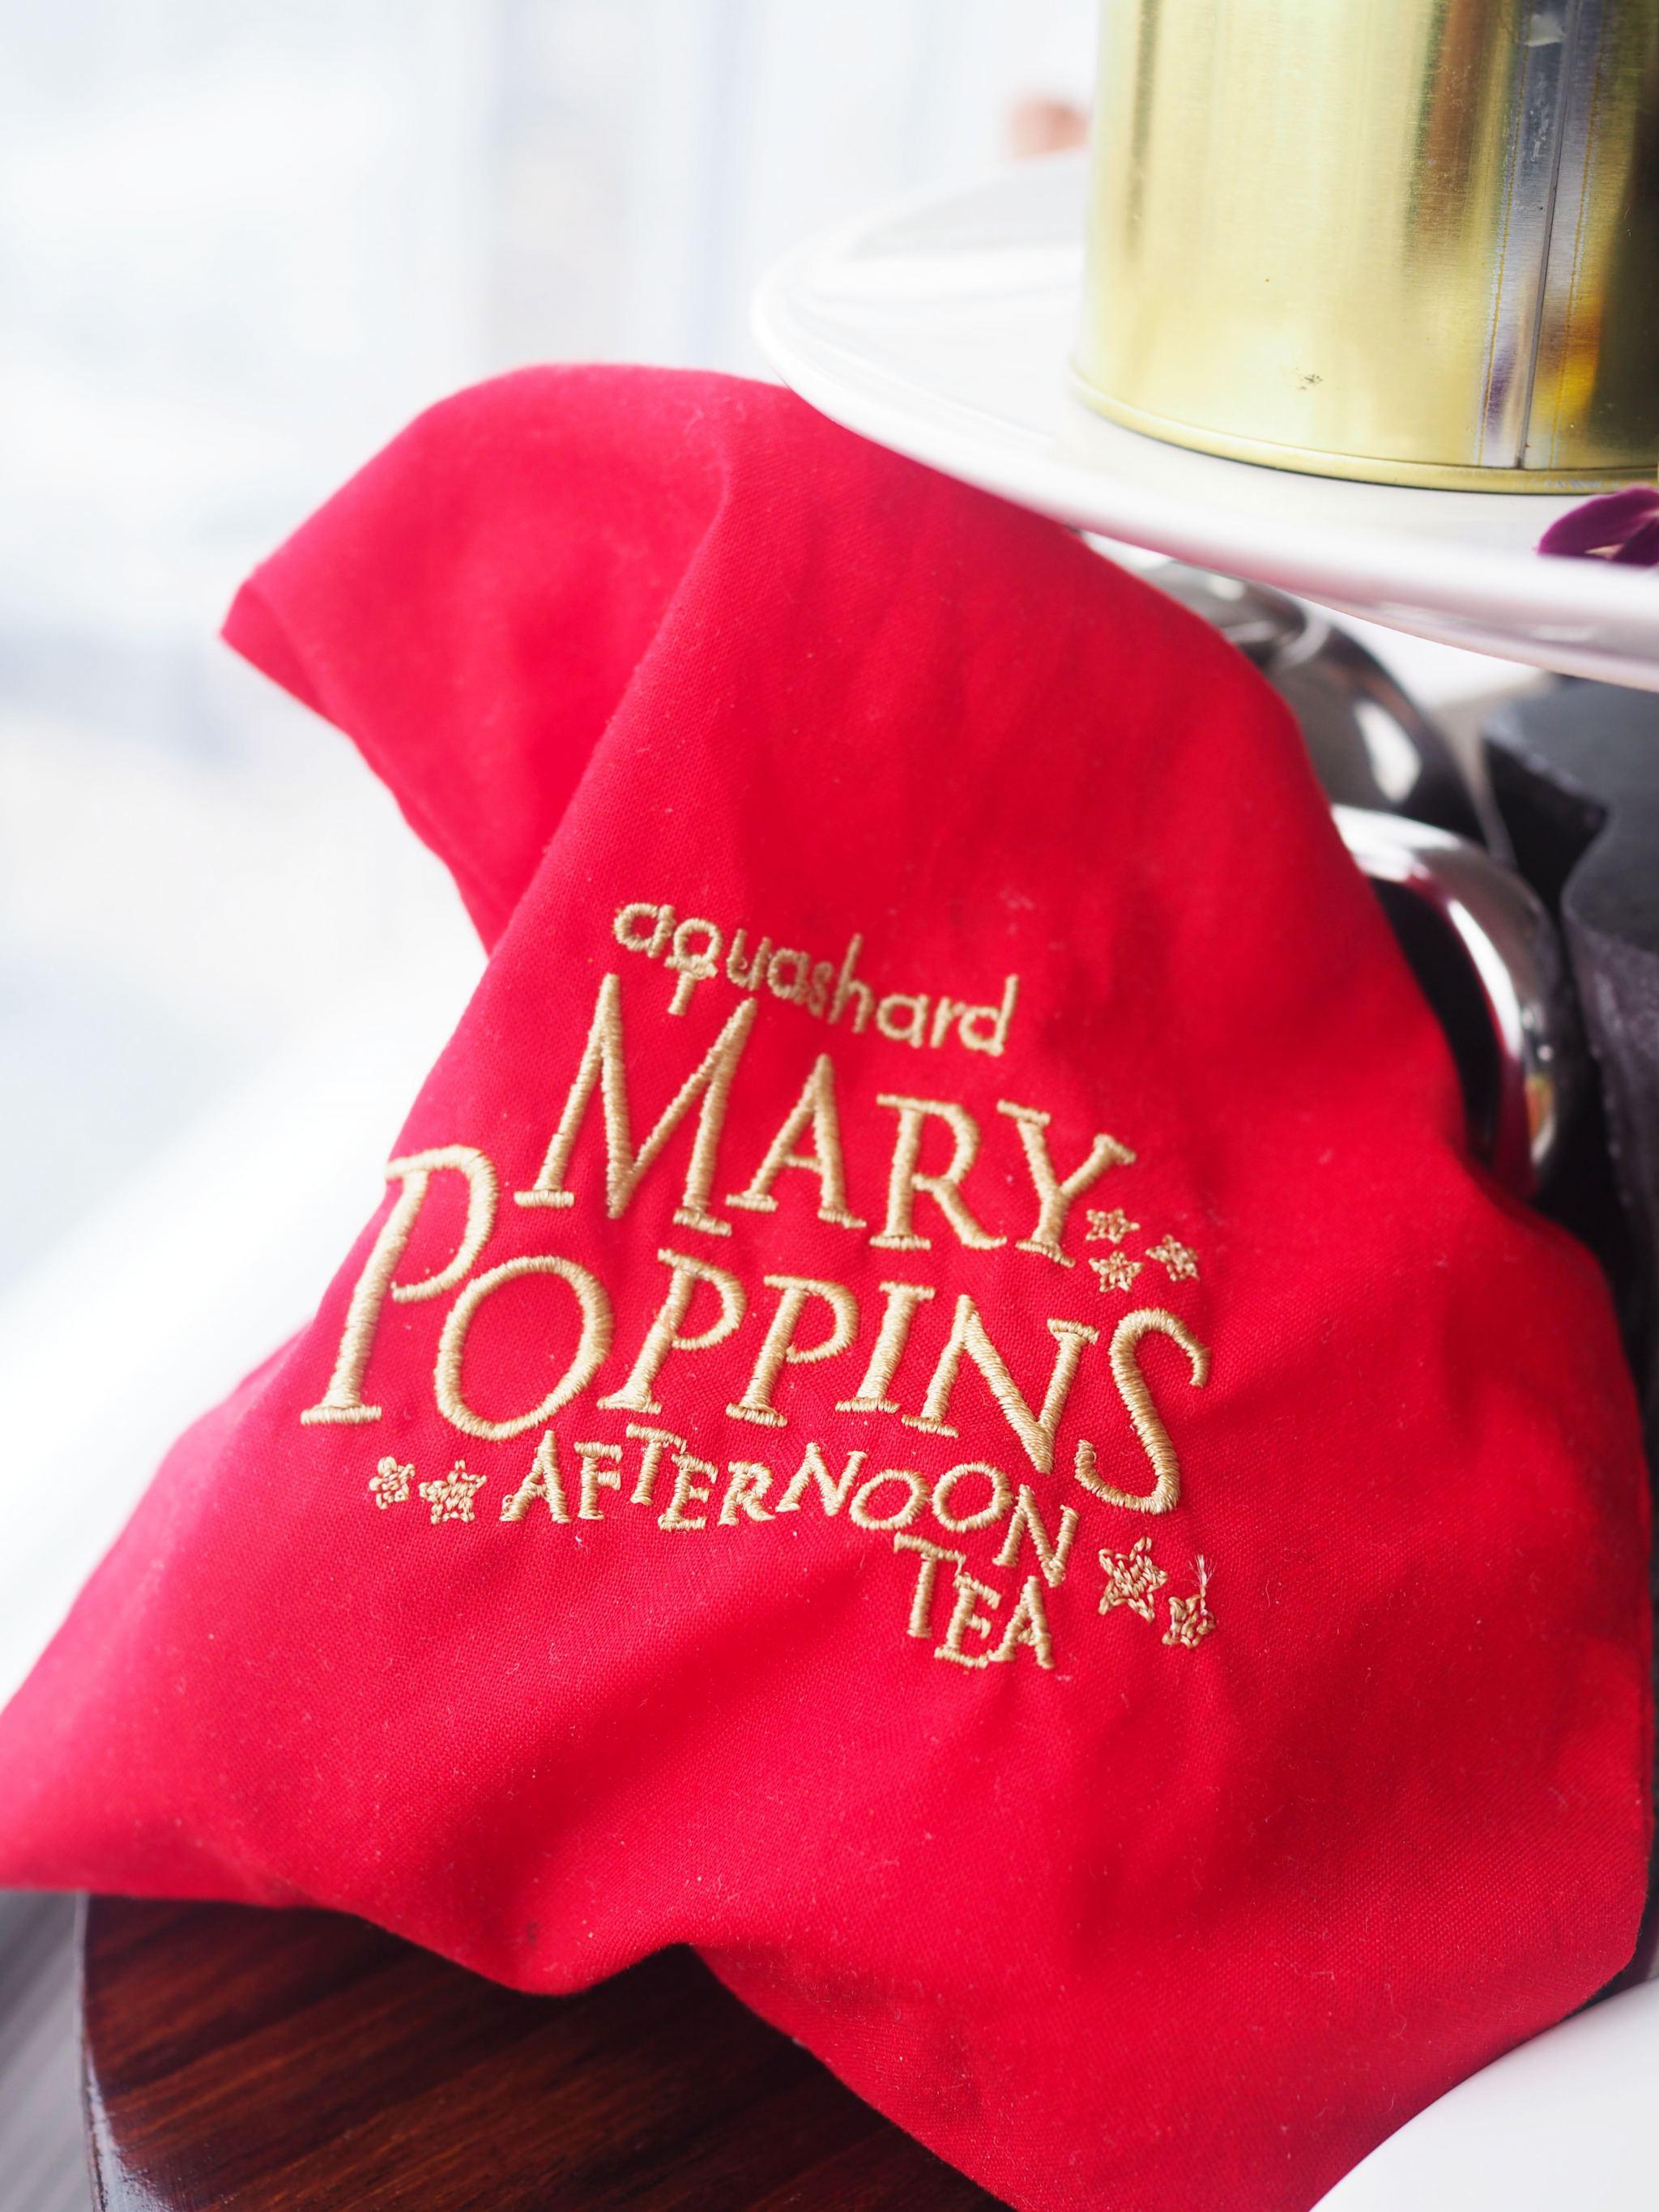 Mary Poppins Afternoon Tea - Aqua Shard